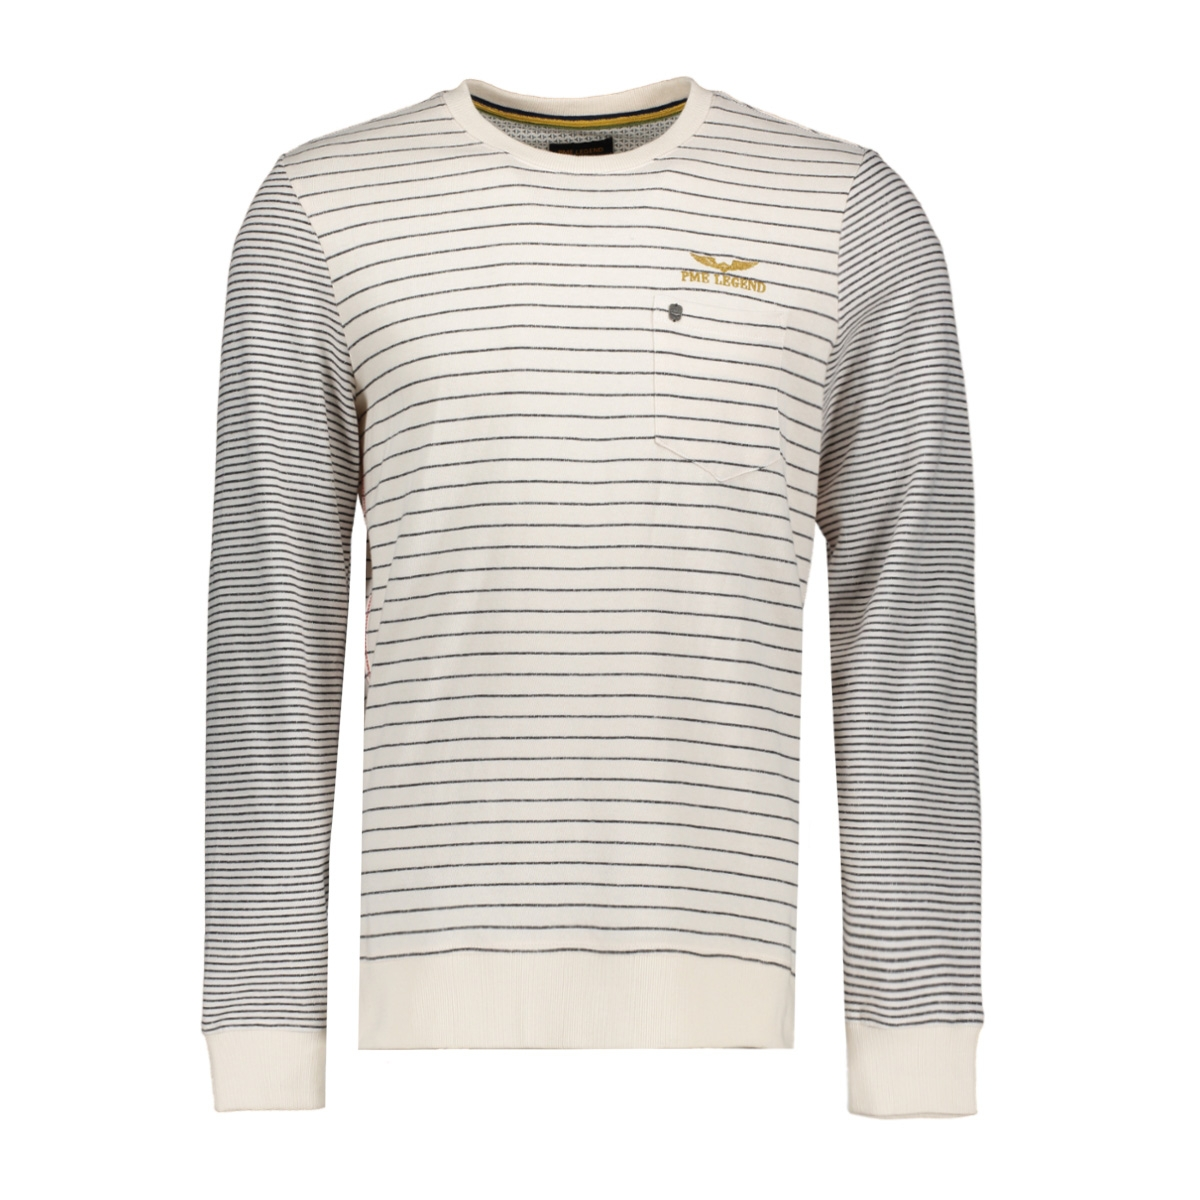 long sleeve striped jersey pts201504 pme legend t-shirt 7013